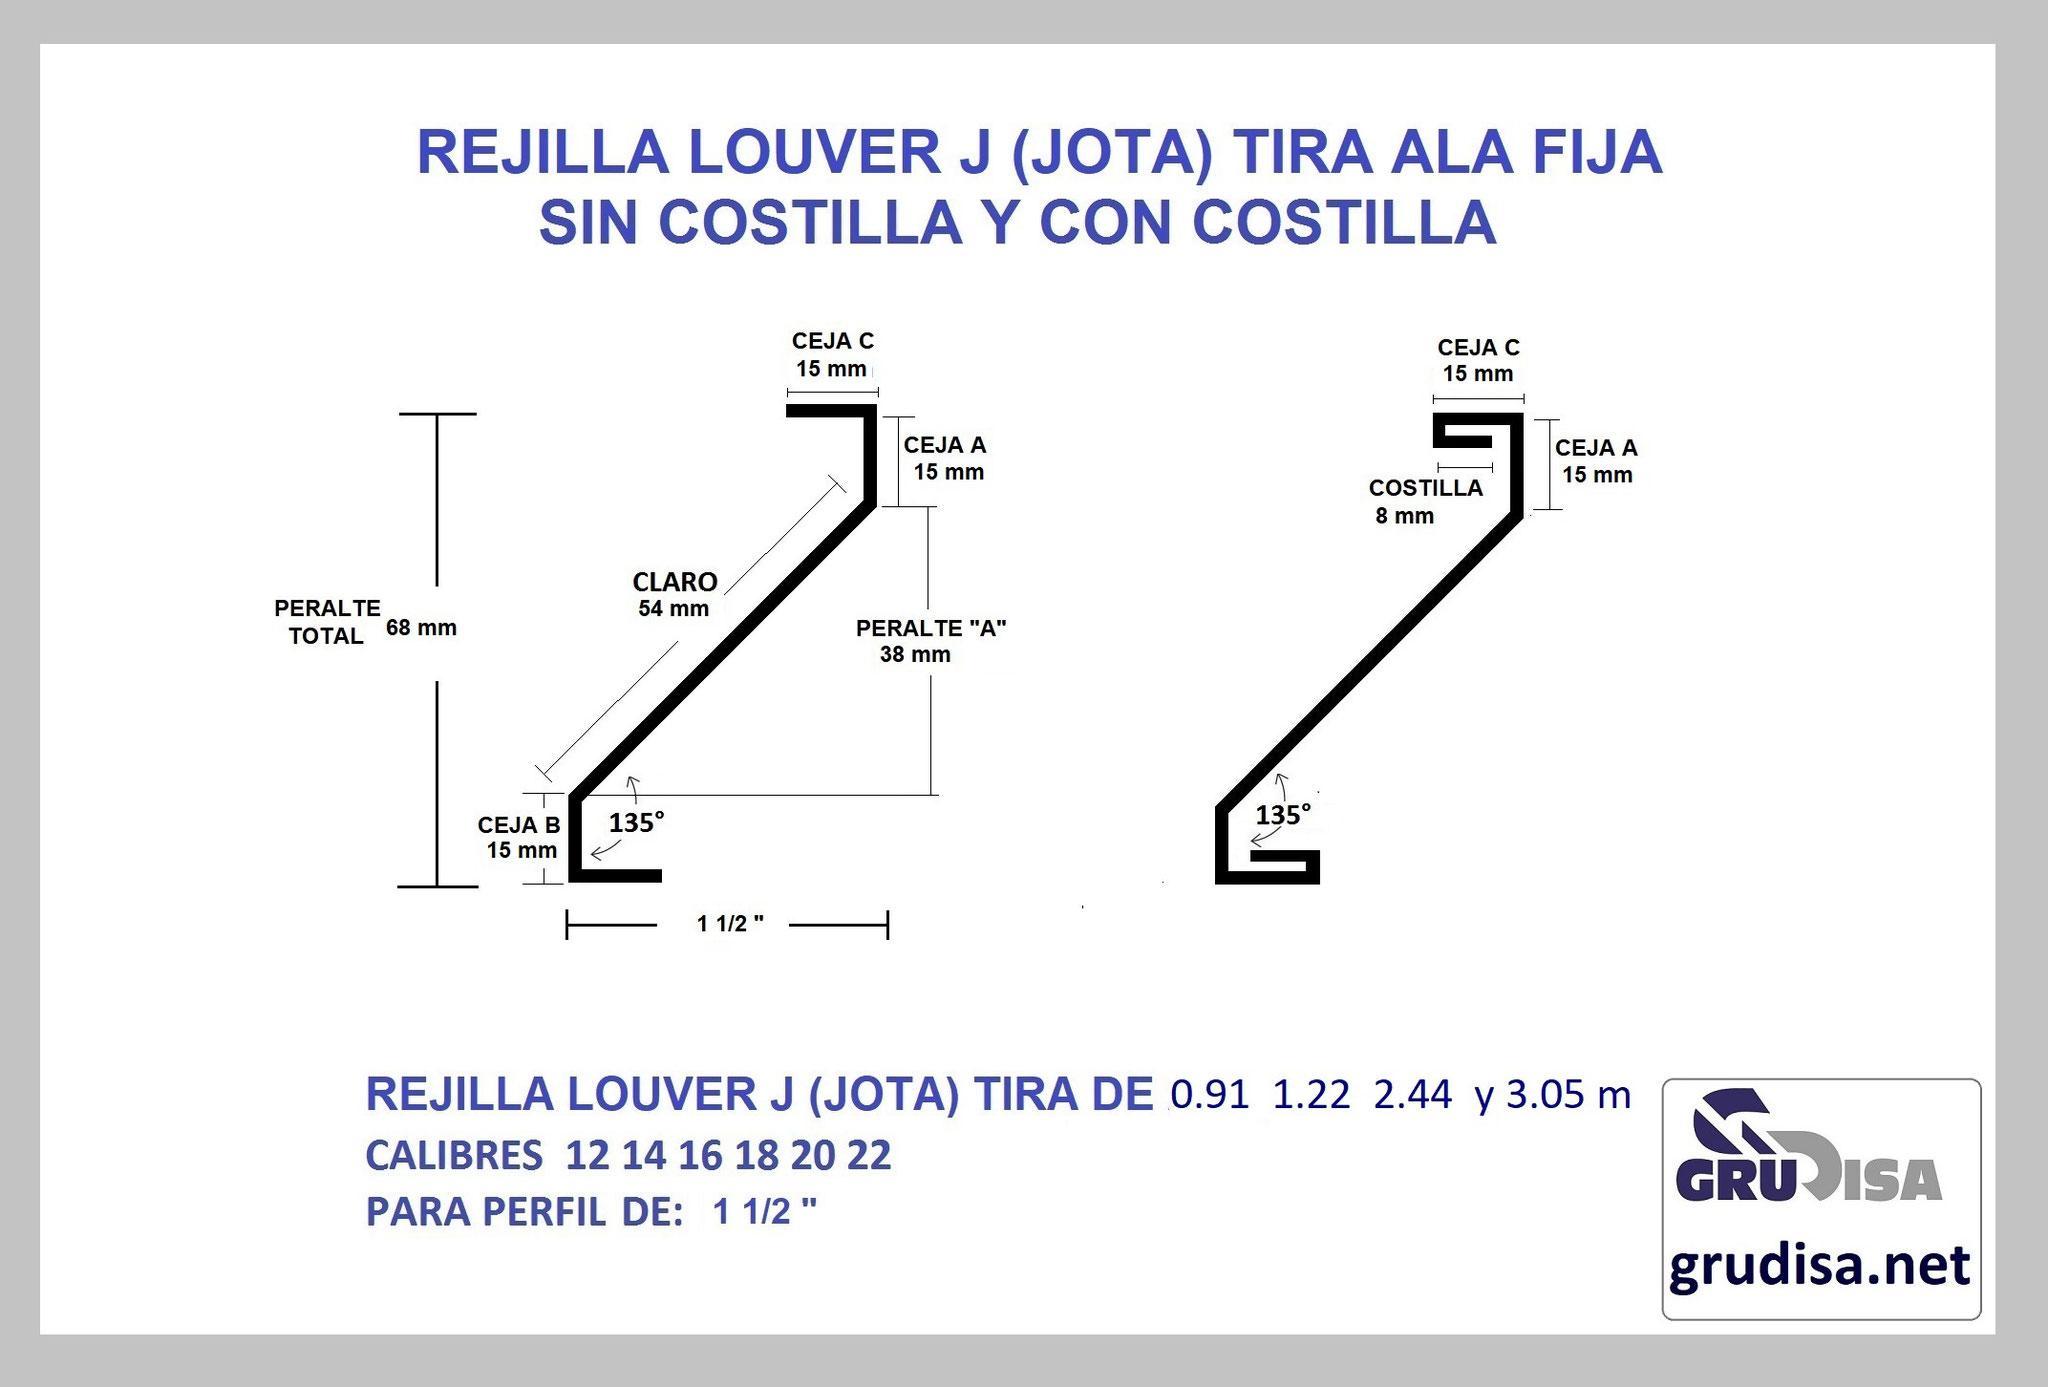 "TIRA PARA REJILLA LOUVER JOTA PARA PERFIL DE 1 1/2"""